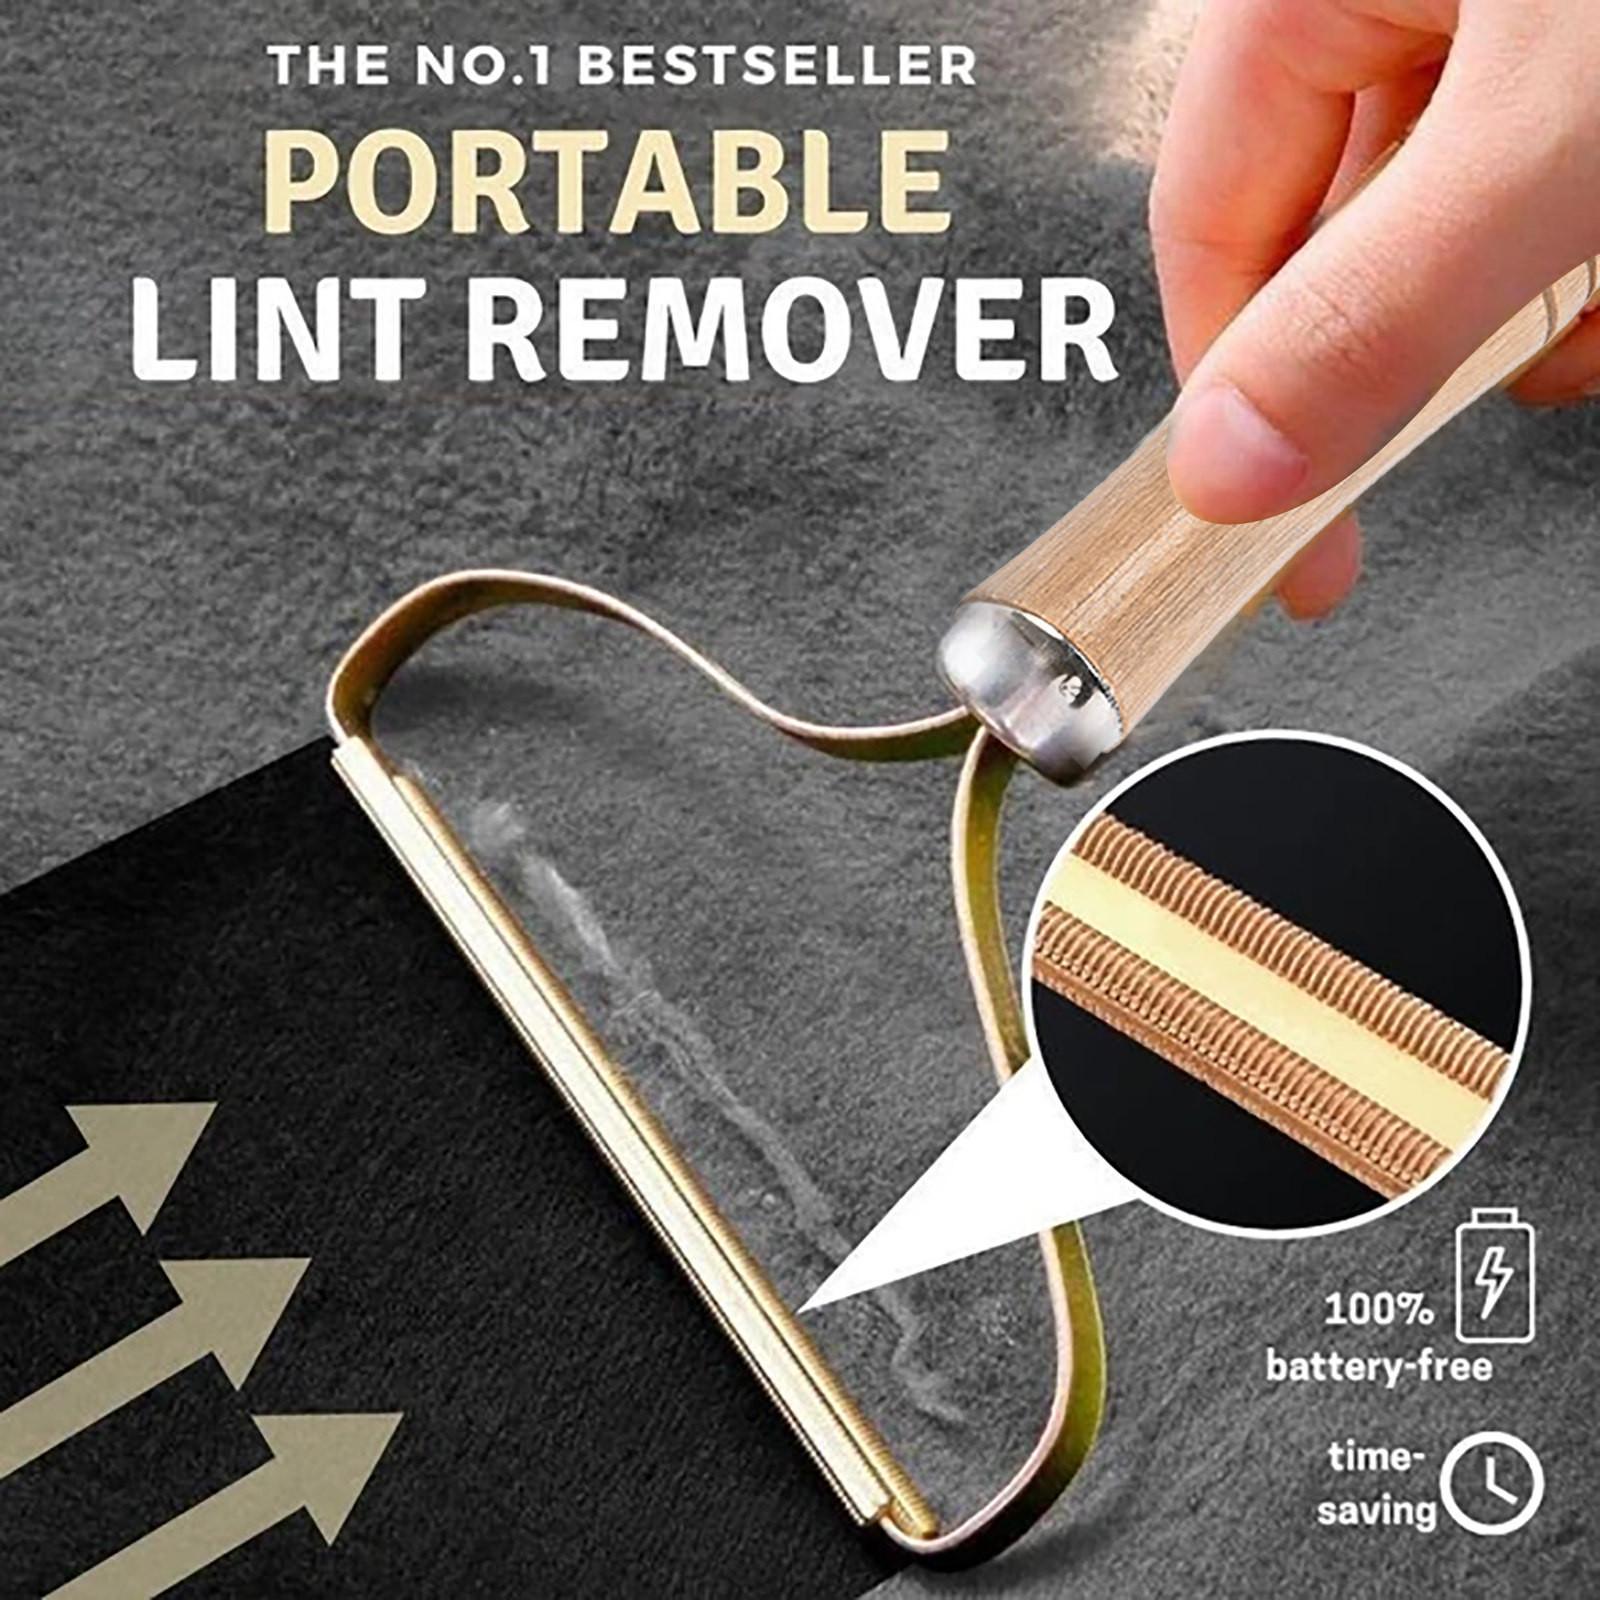 2PC Mini Portable Lint Remover Fuzz Fabric Shaver For Carpet Woolen Coat Clothes Fluff Fabric Shaver Brush Tool Fur Remover